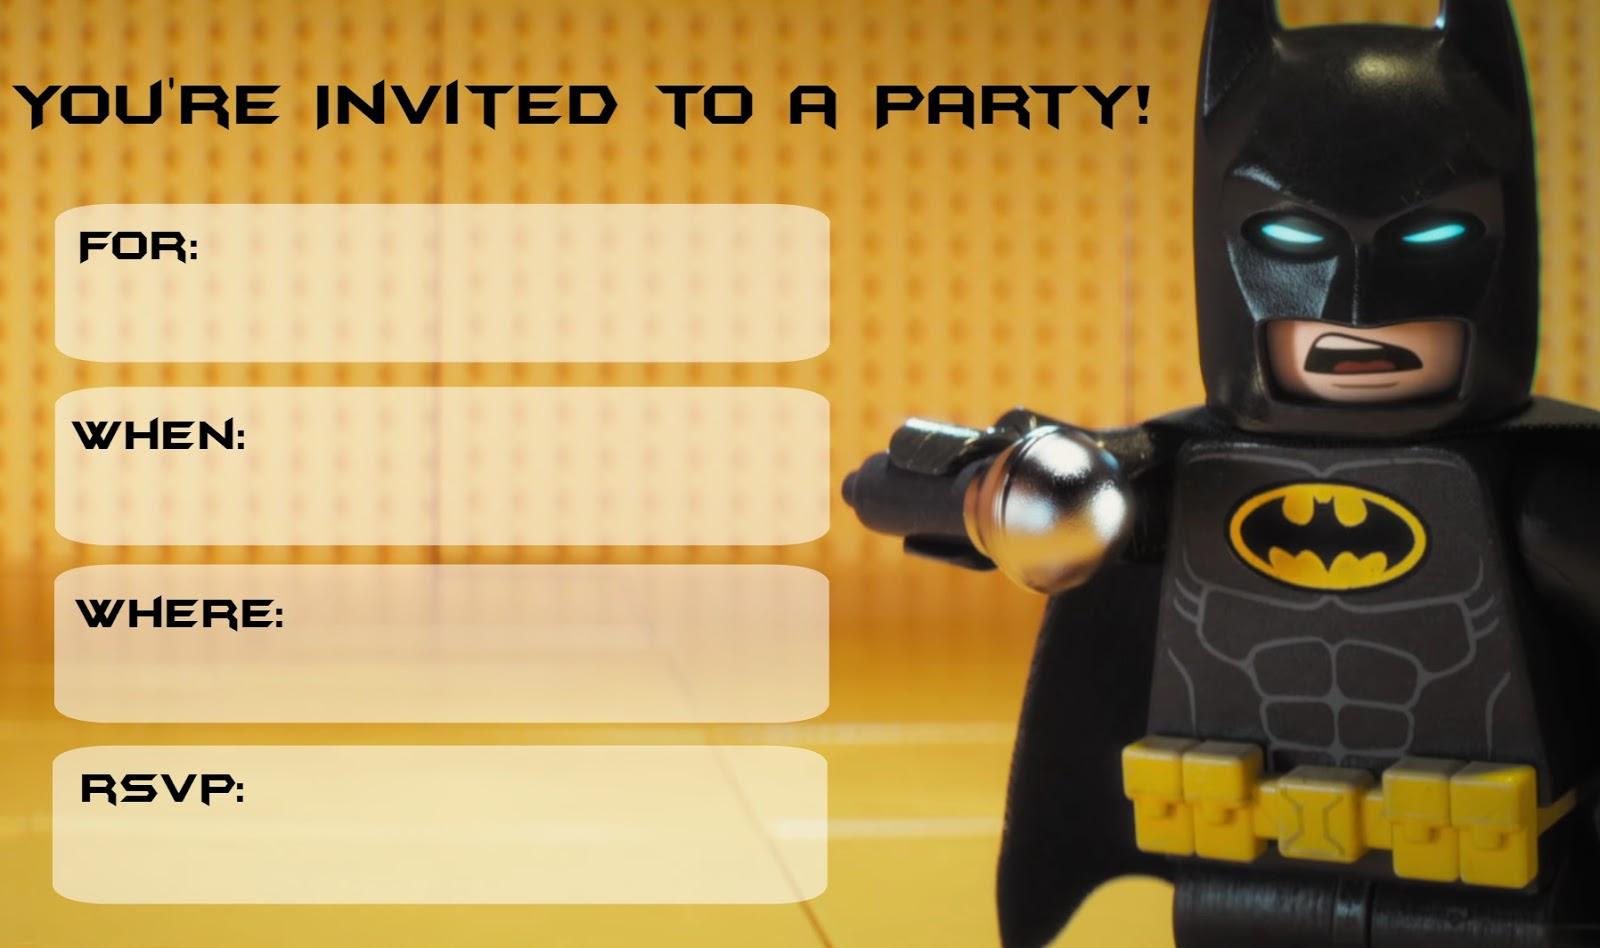 LEGO Batman%2BInvitations musings of an average mom lego batman movie party invitations,Lego Batman Movie Invitations